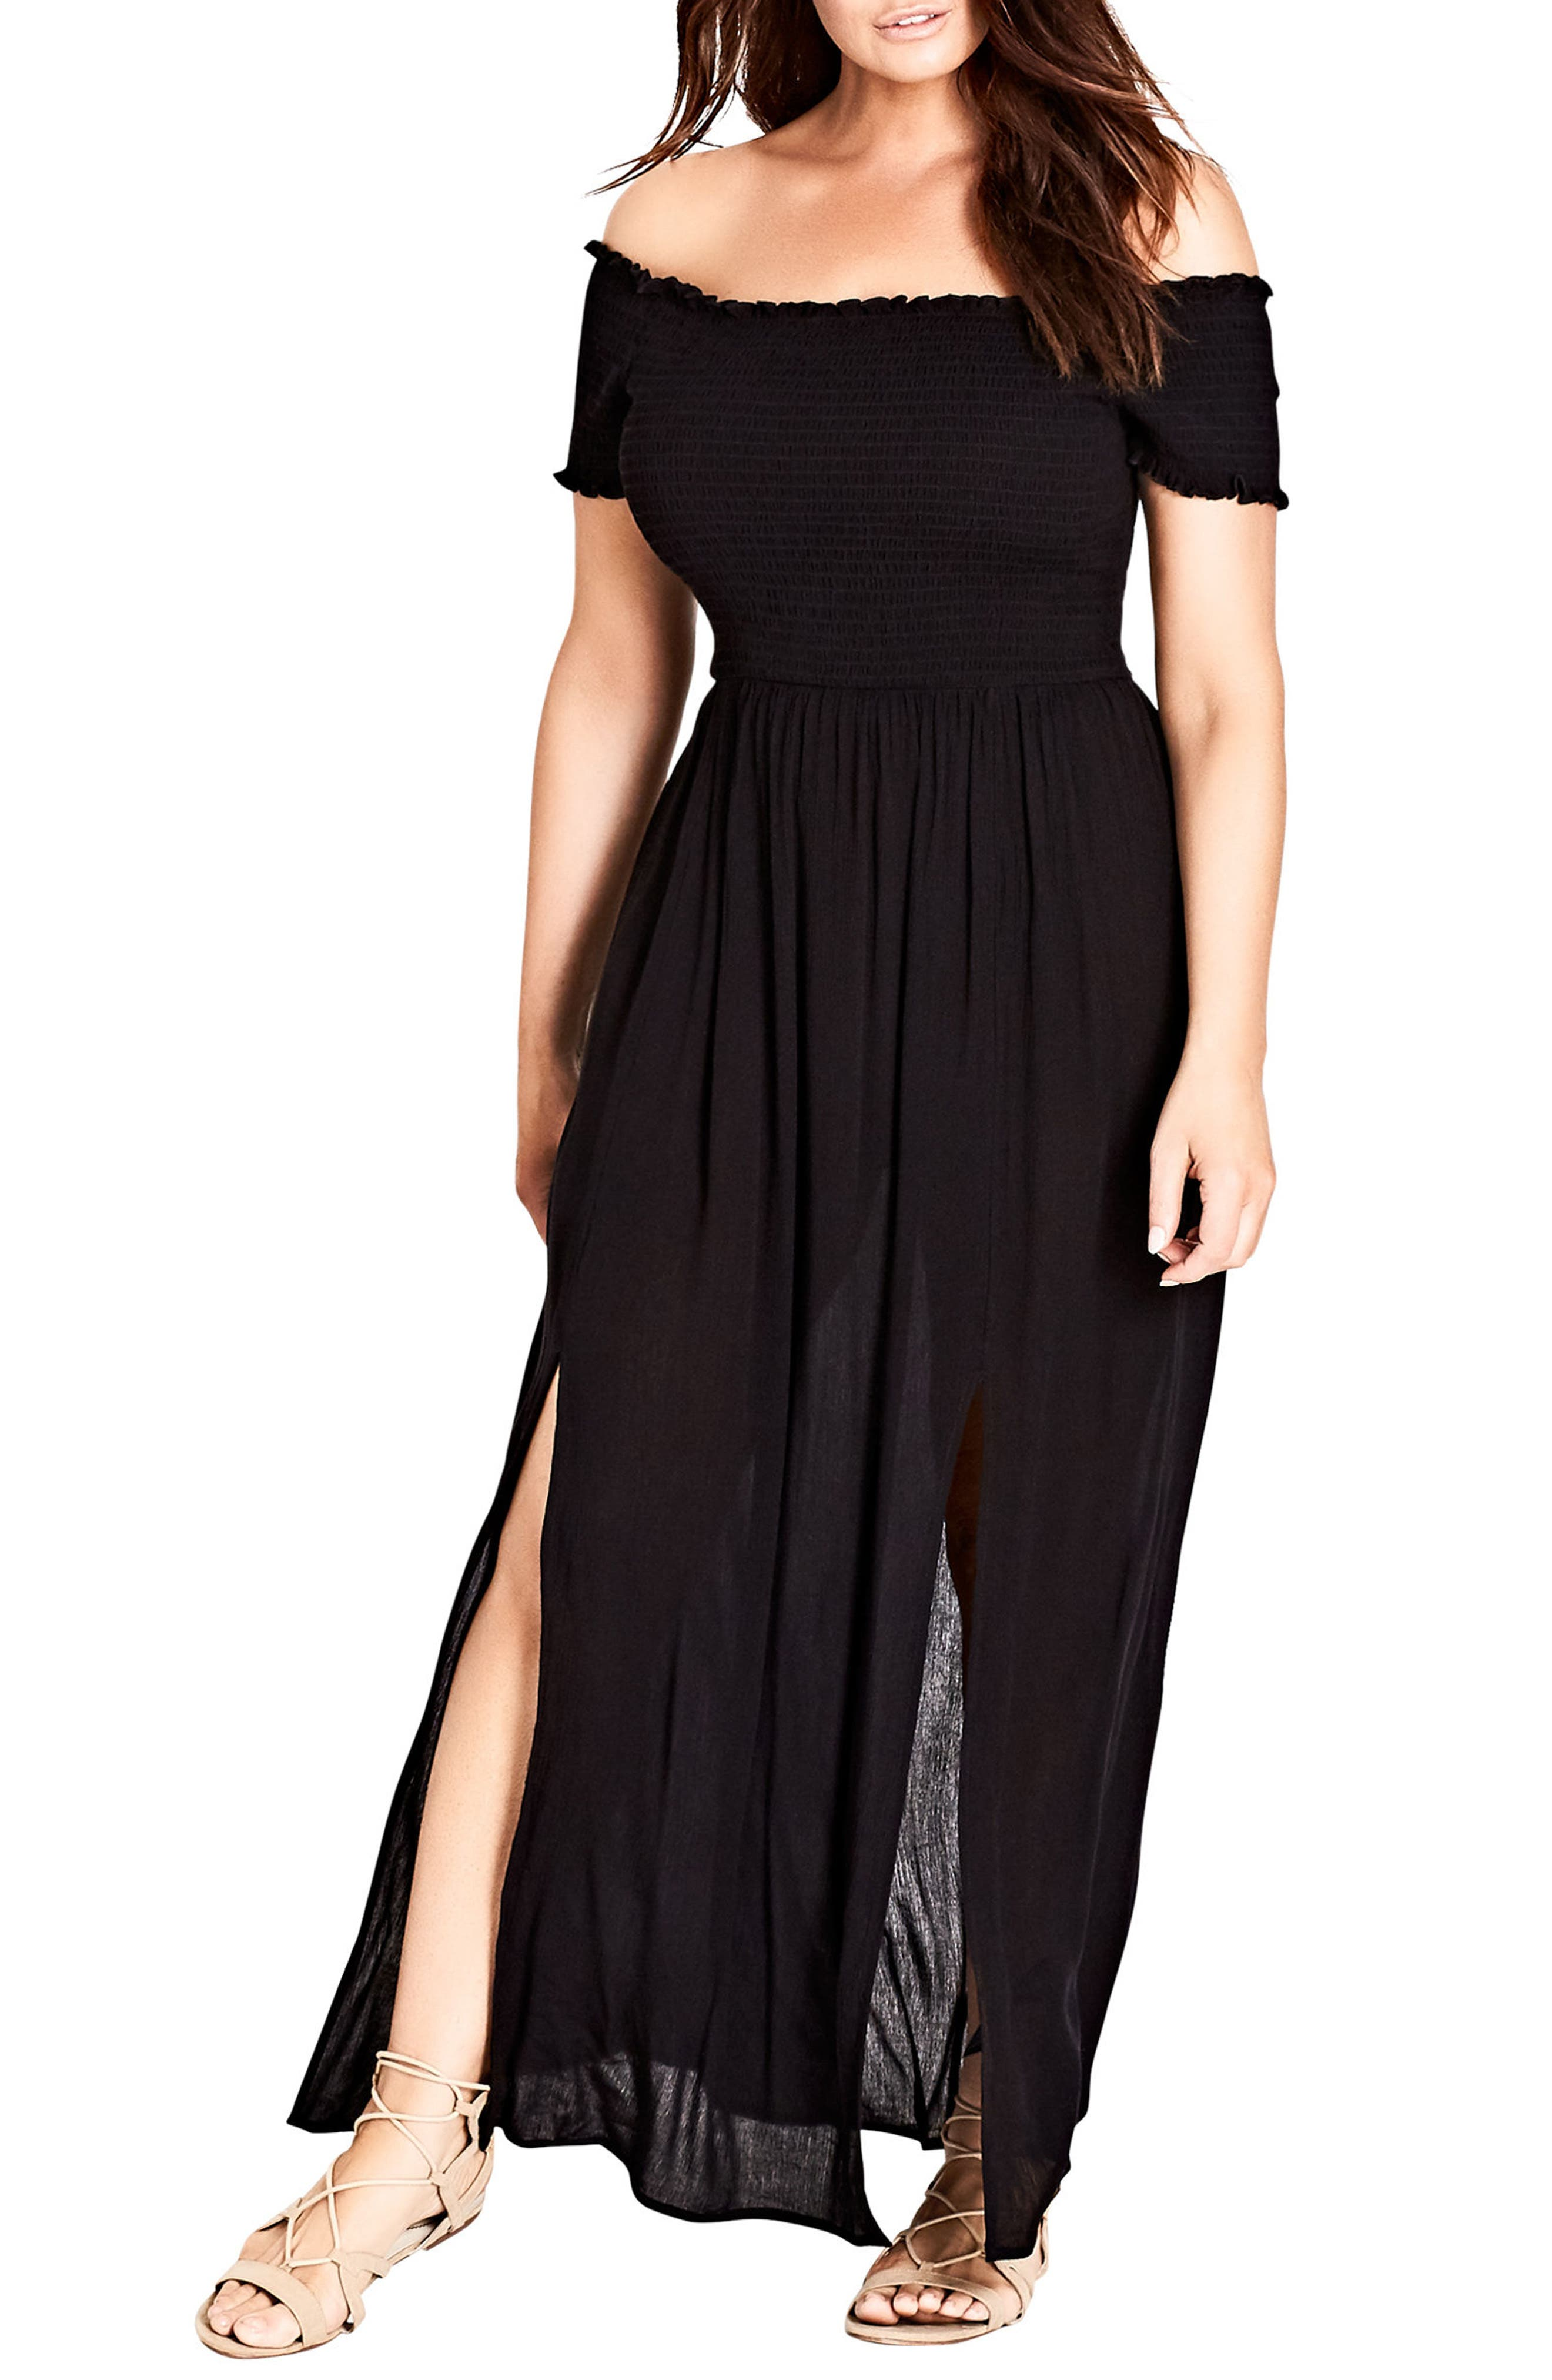 Smocked Off the Shoulder Maxi Dress,                             Main thumbnail 1, color,                             001